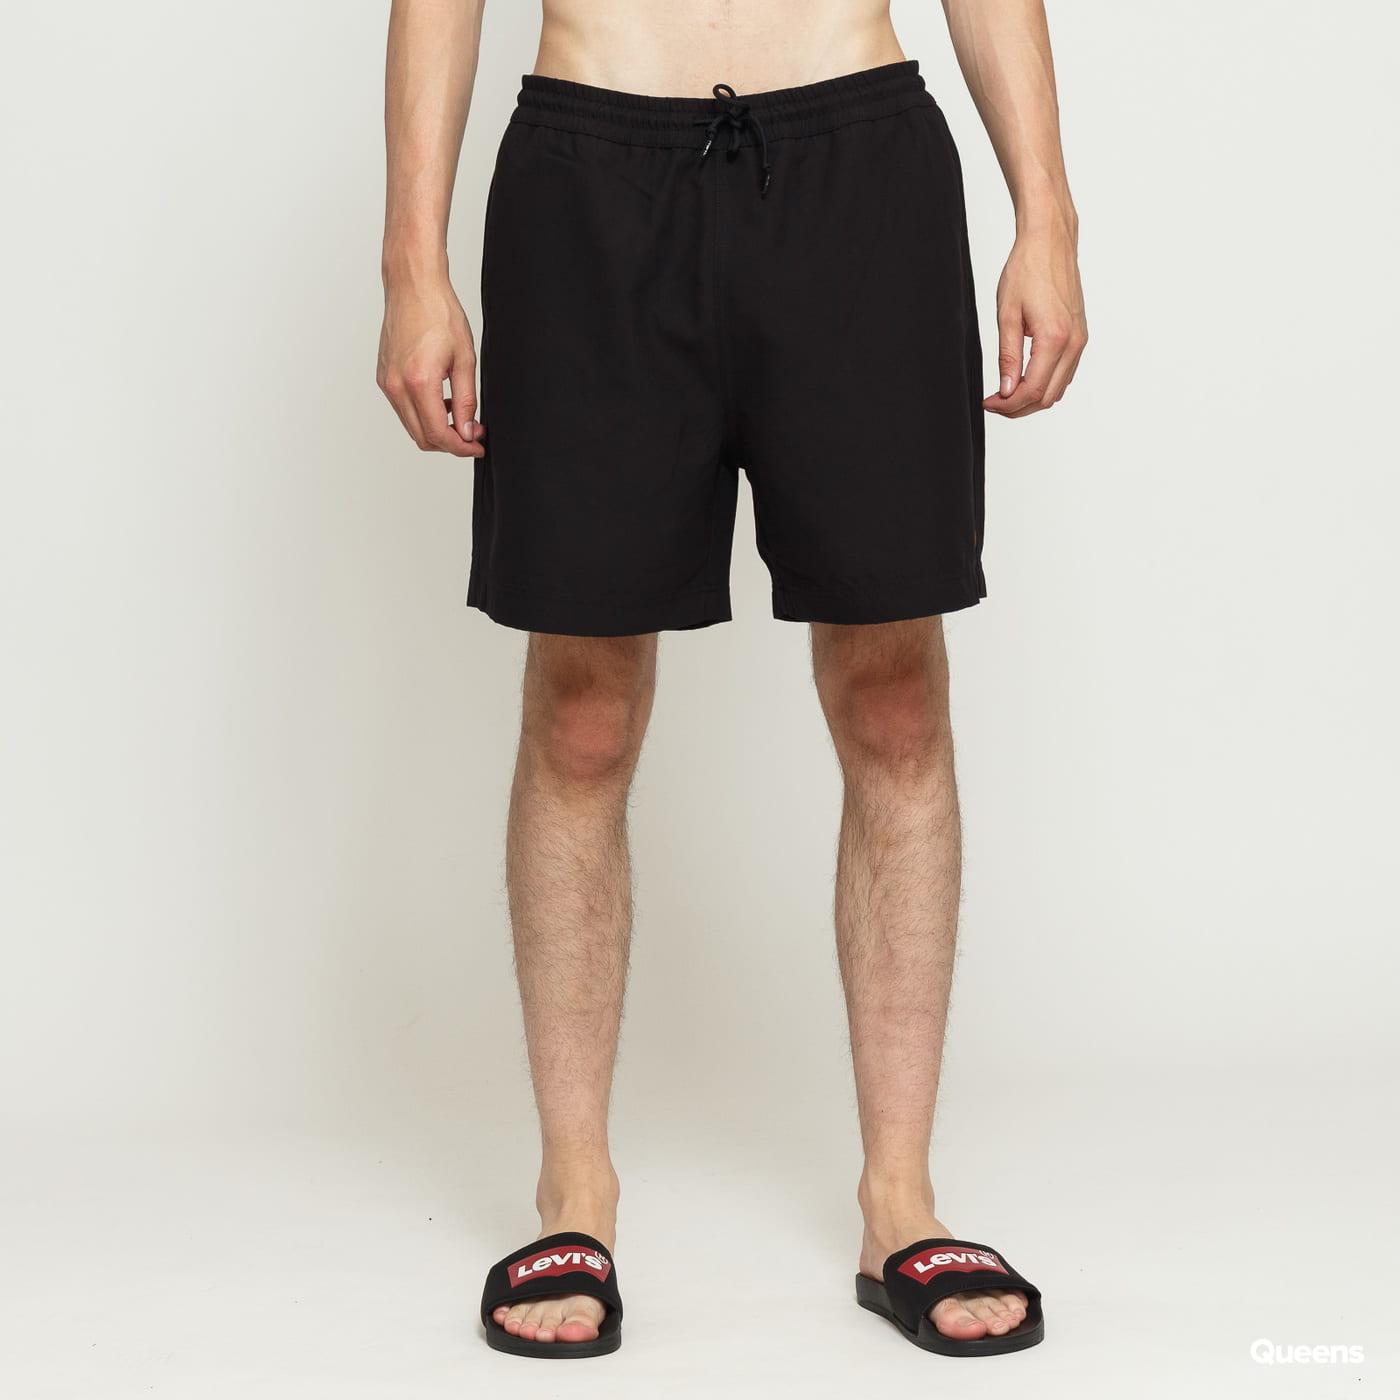 1e767a9232 Men Swim Shorts Carhartt WIP Chase Swim Trunks black (I026235.89.90.03) –  Queens 💚